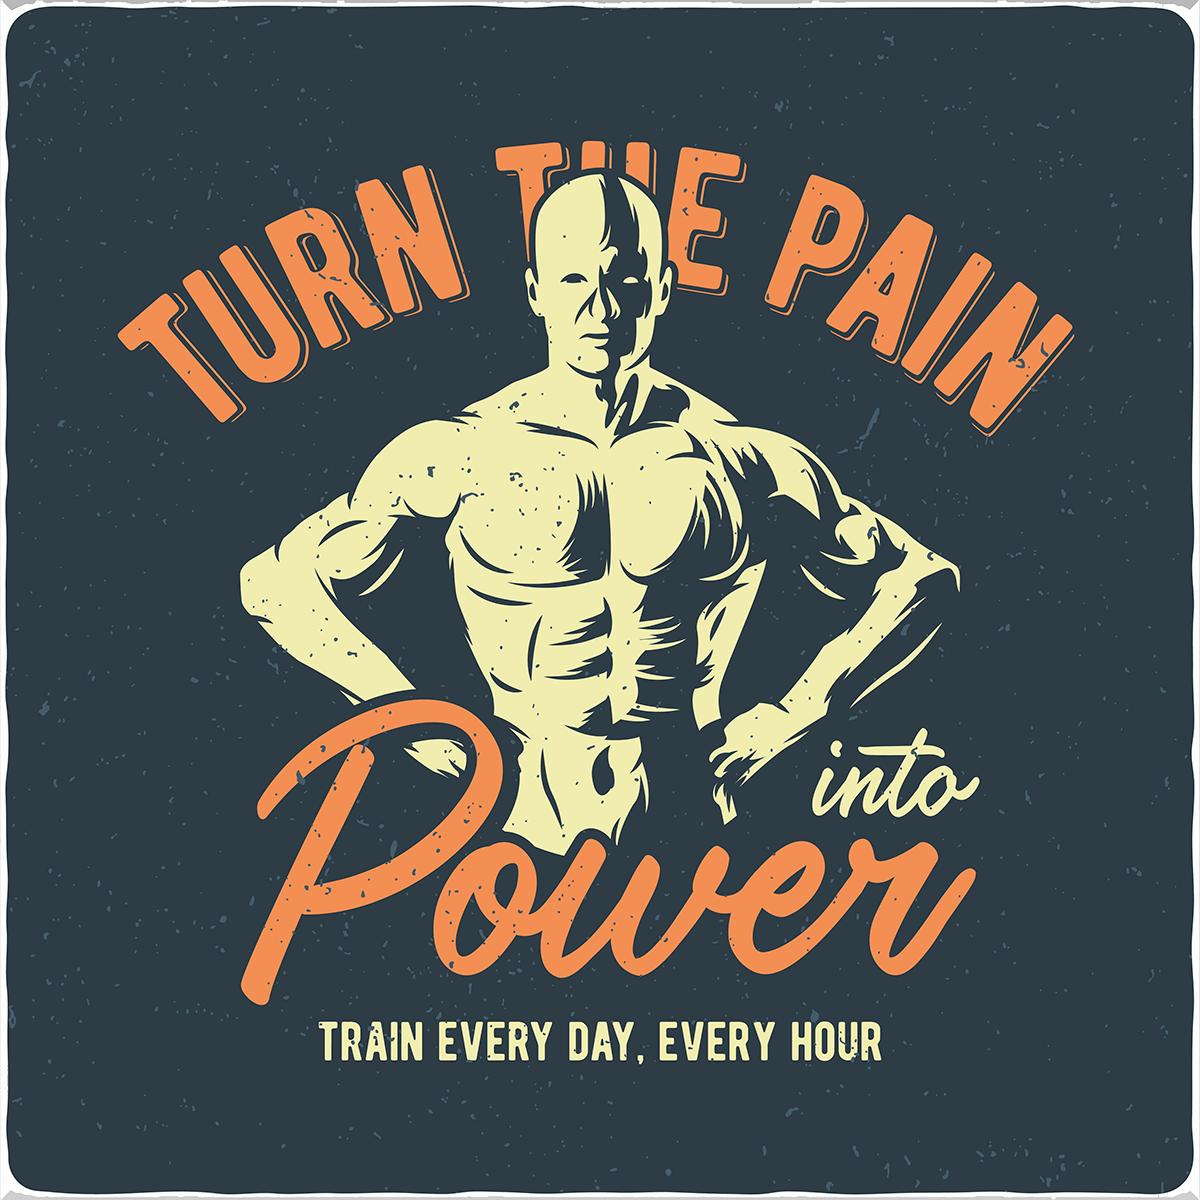 Vewandle den Schmerz in Energie! - Bild: Vozzy|Shutterstock.com